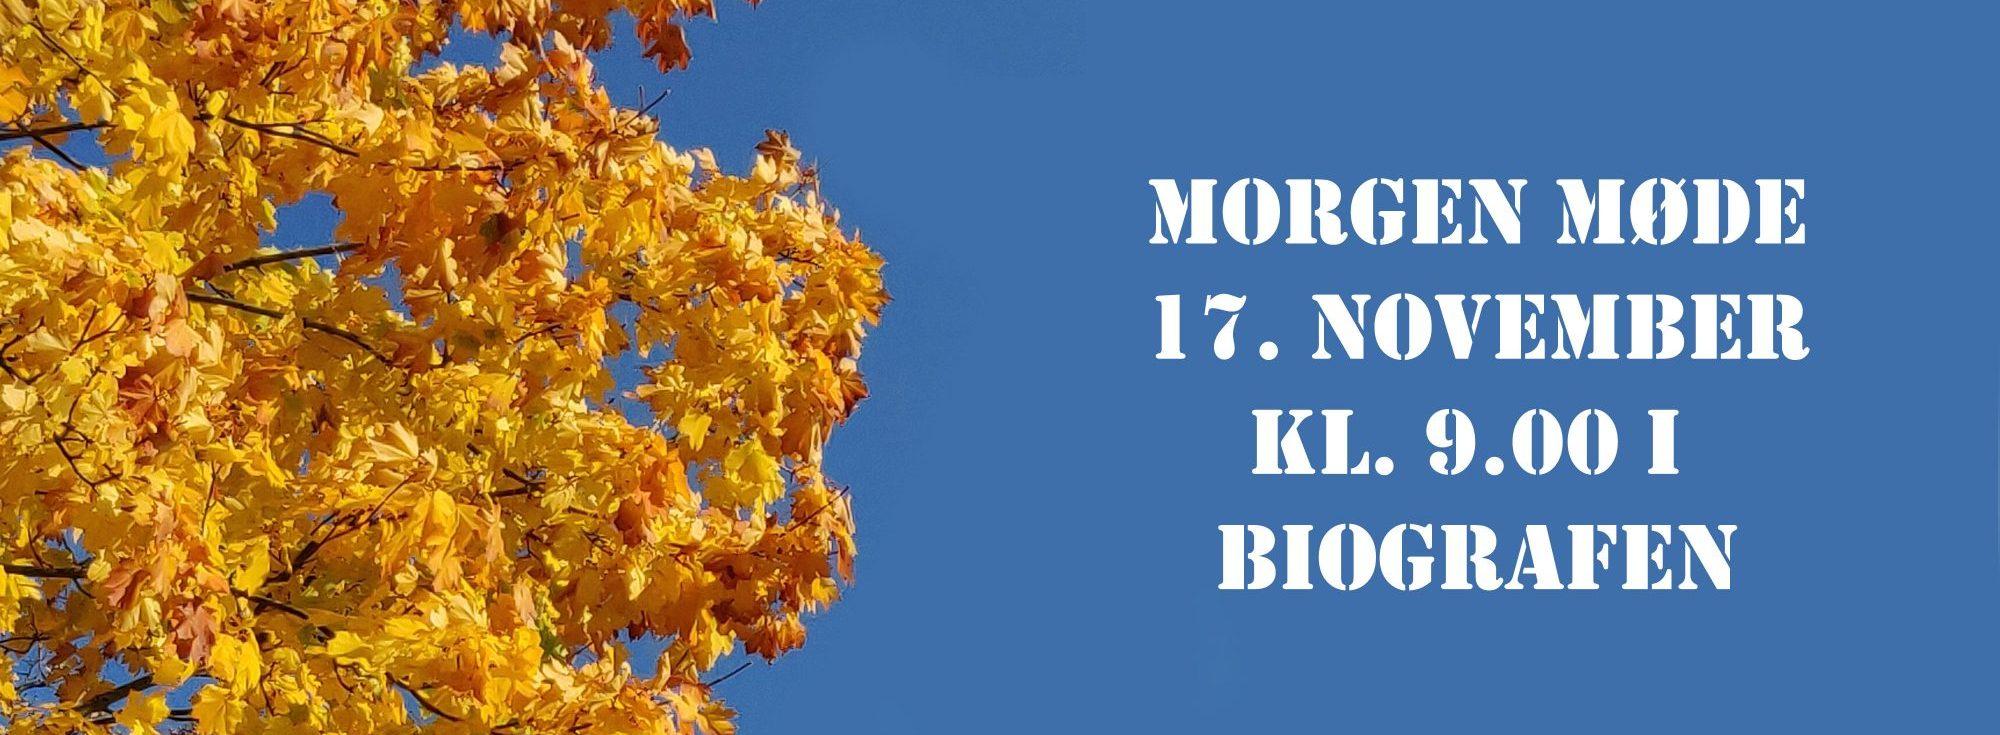 Morgenmøde 17. november